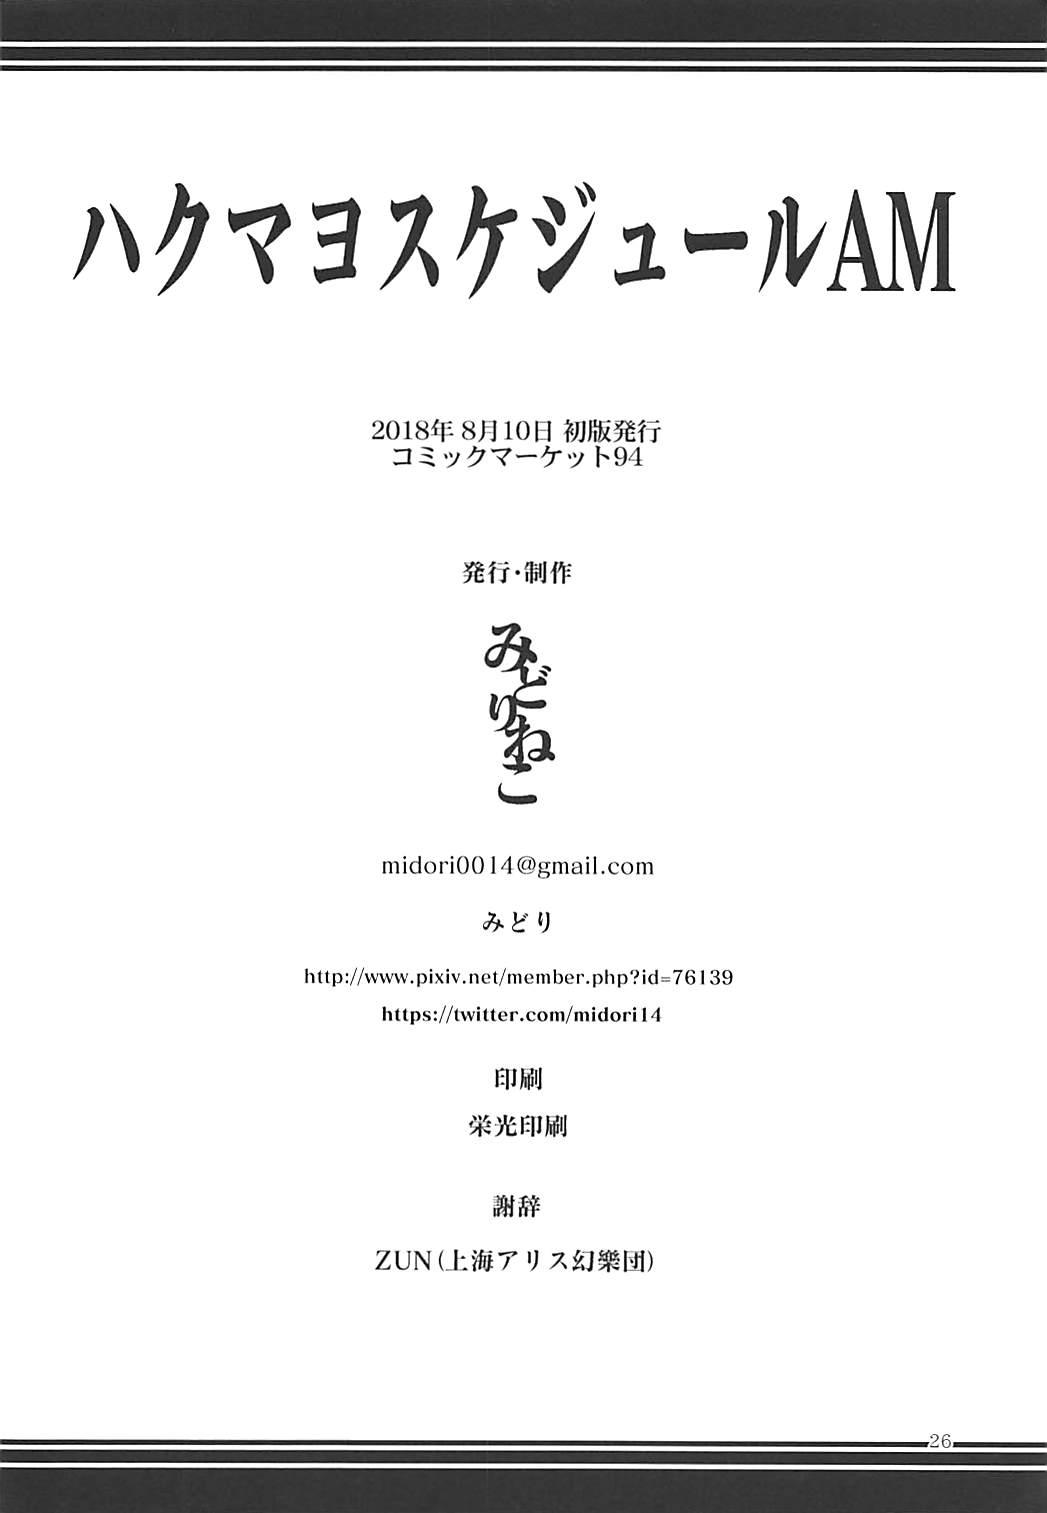 Hakumayo Schedule AM 26